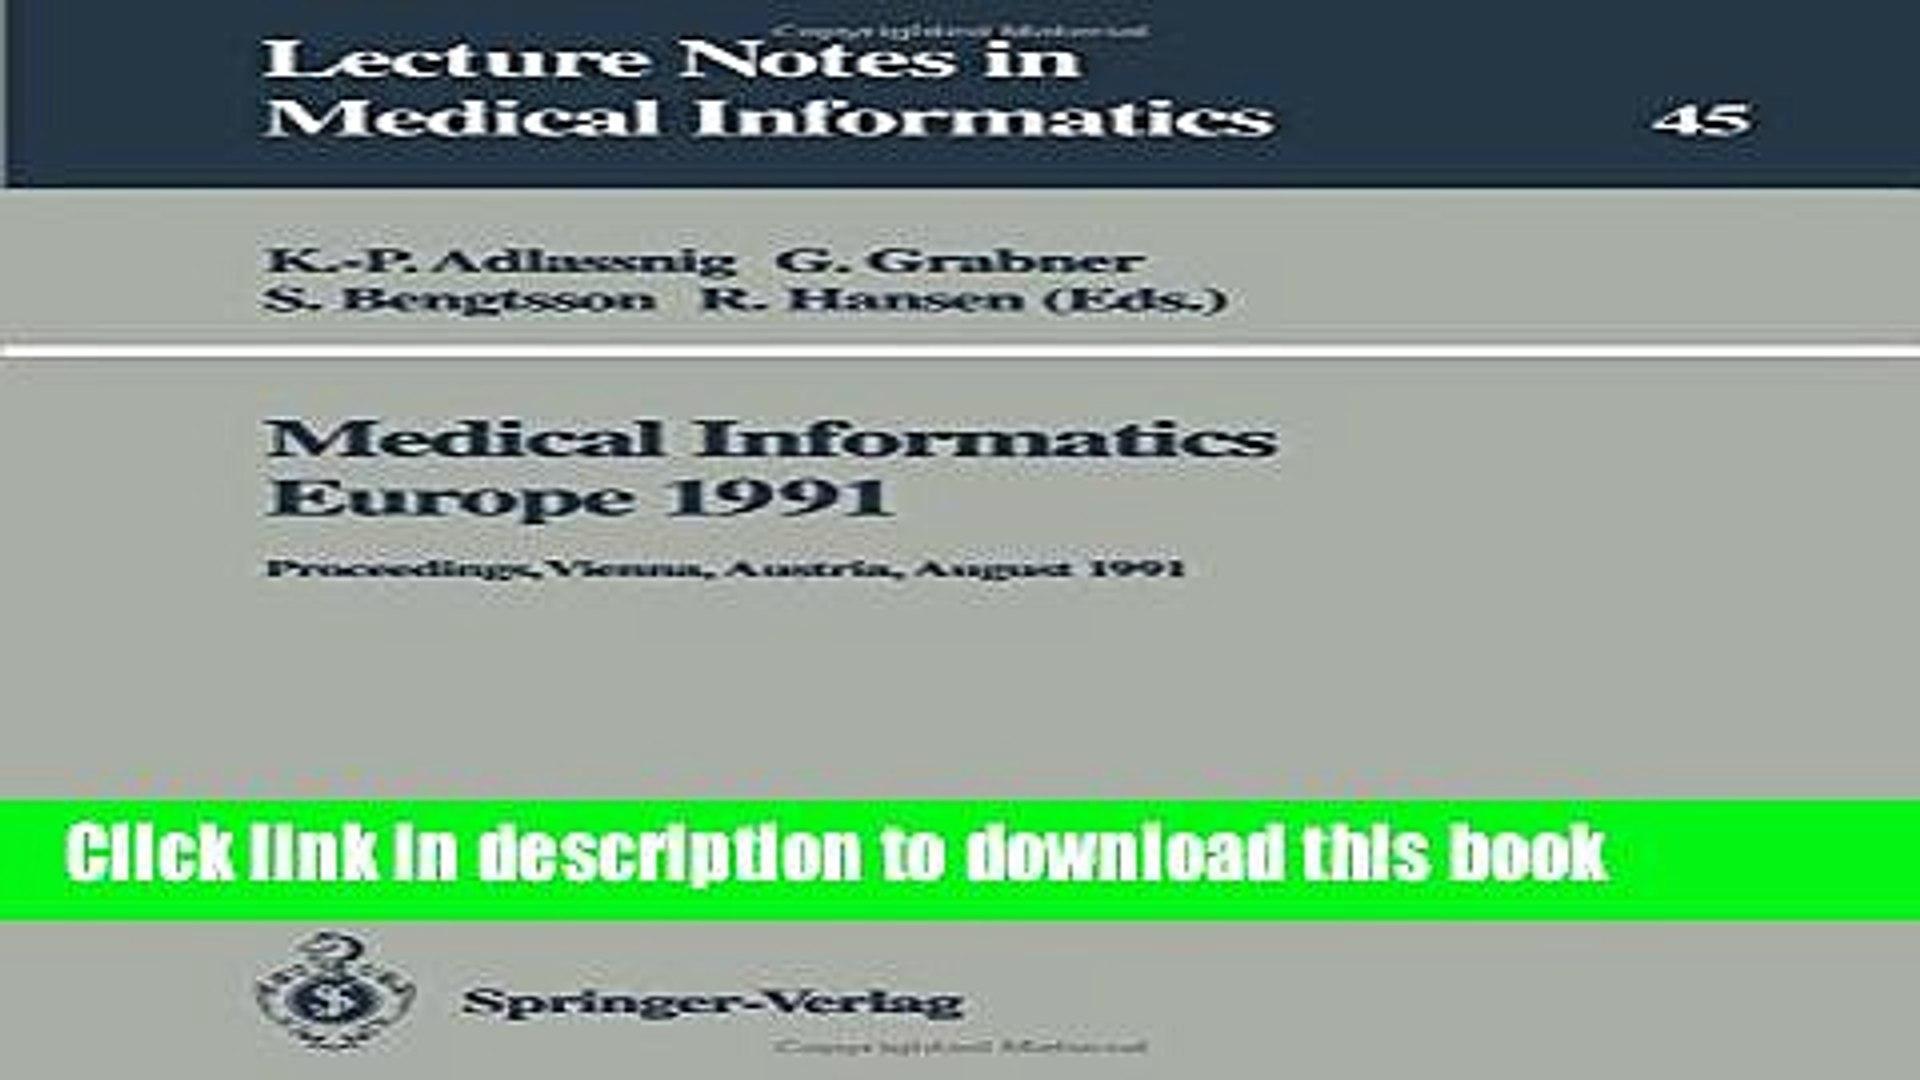 Medical Informatics Europe '90: Proceedings, Glasgow, Scotland, August 20–23, 1990